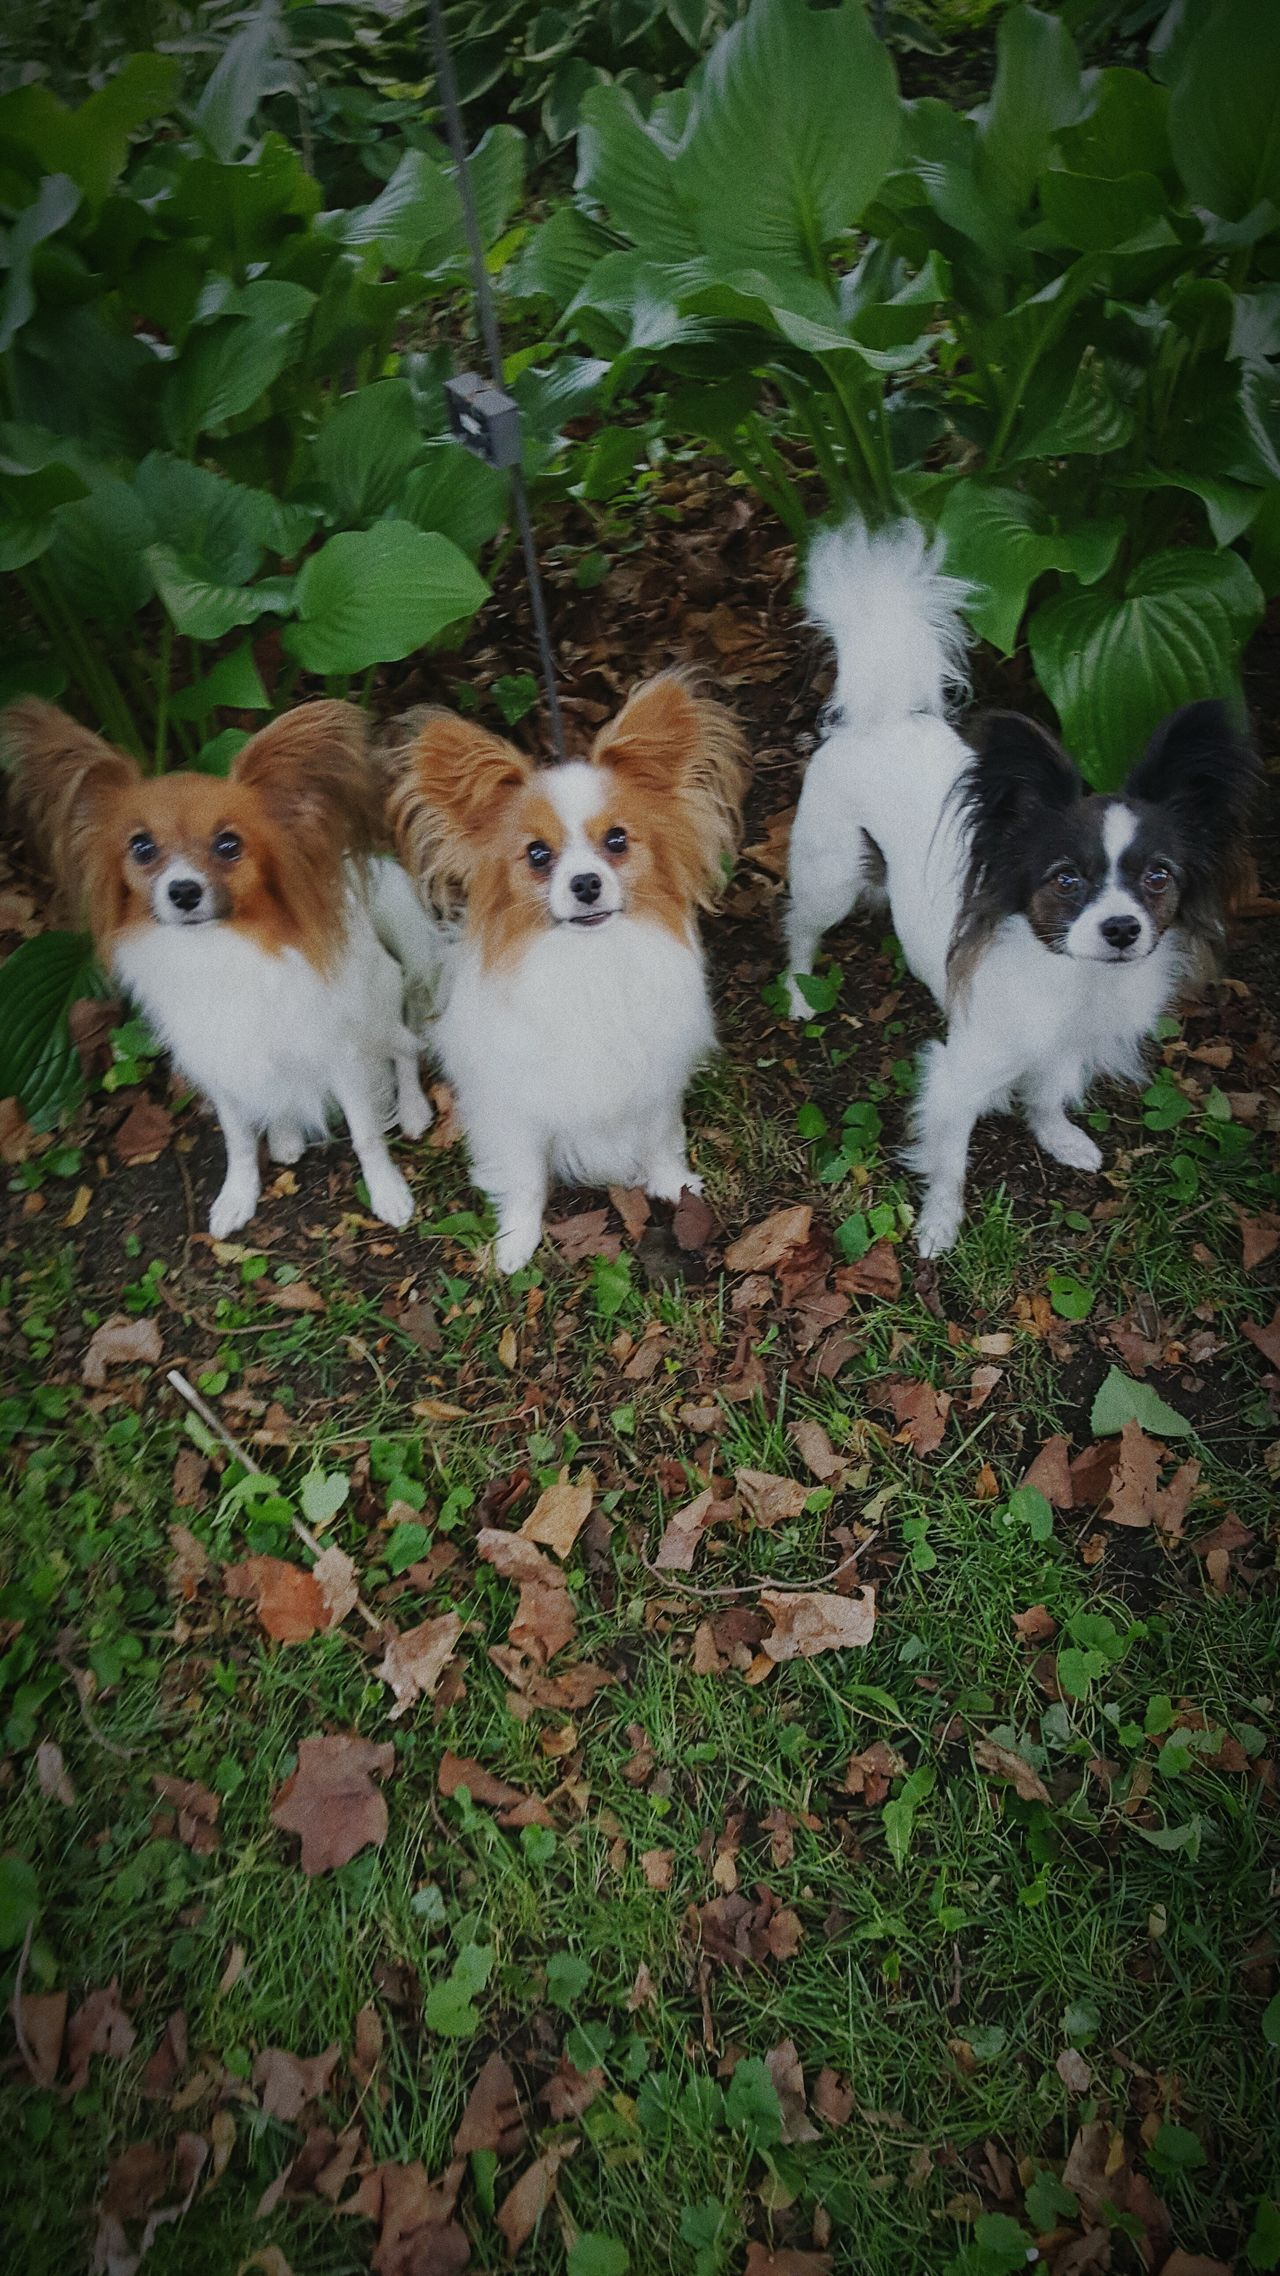 Ilovemydog Papillion, Dog, Cute, Precious, Furry Dogslife Beautiful Day Its A Dogs Life Dogstagram Bestfriends Mansbestfriend